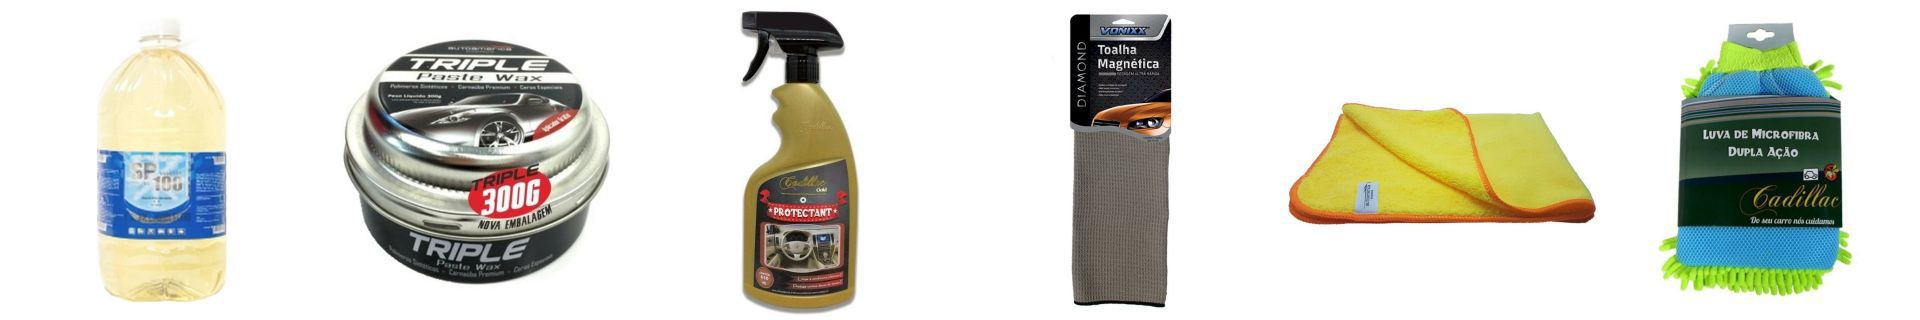 Kit Shampoo+Luva Microfibra+Protectant+Toalha Magnetica+Cera+Flanela